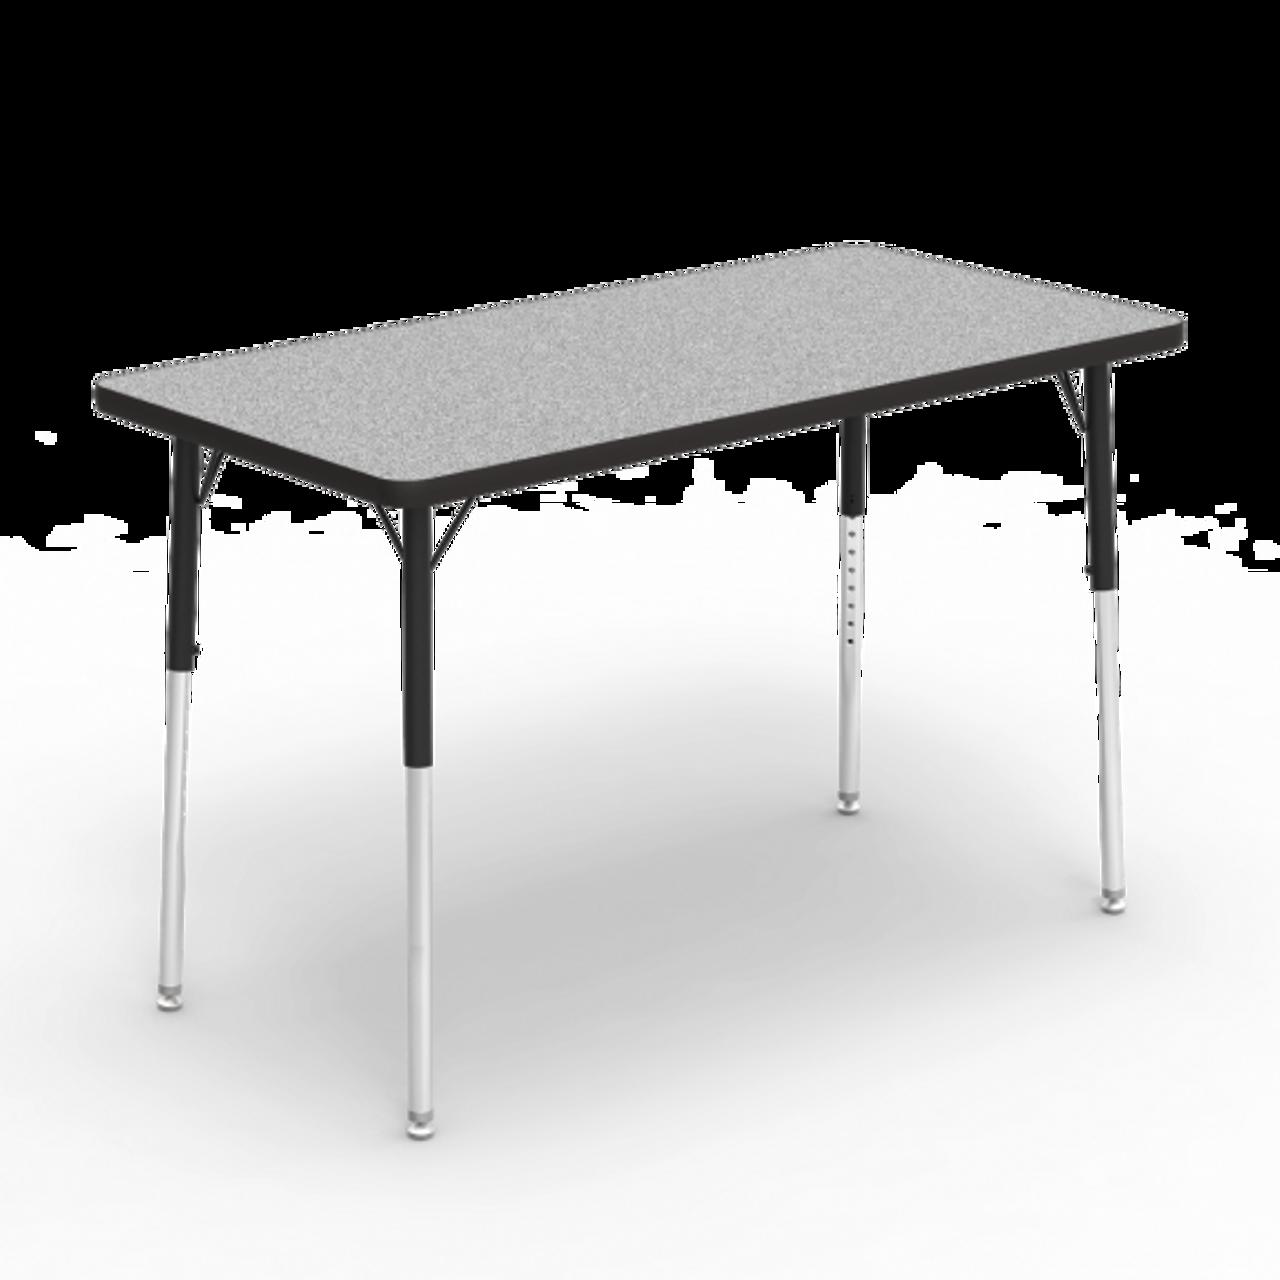 4000 Series 24 X 48 Rectangle Activity Table Grey Nebula Top Char Black Edge Char Black Frame Furniture Tycoon